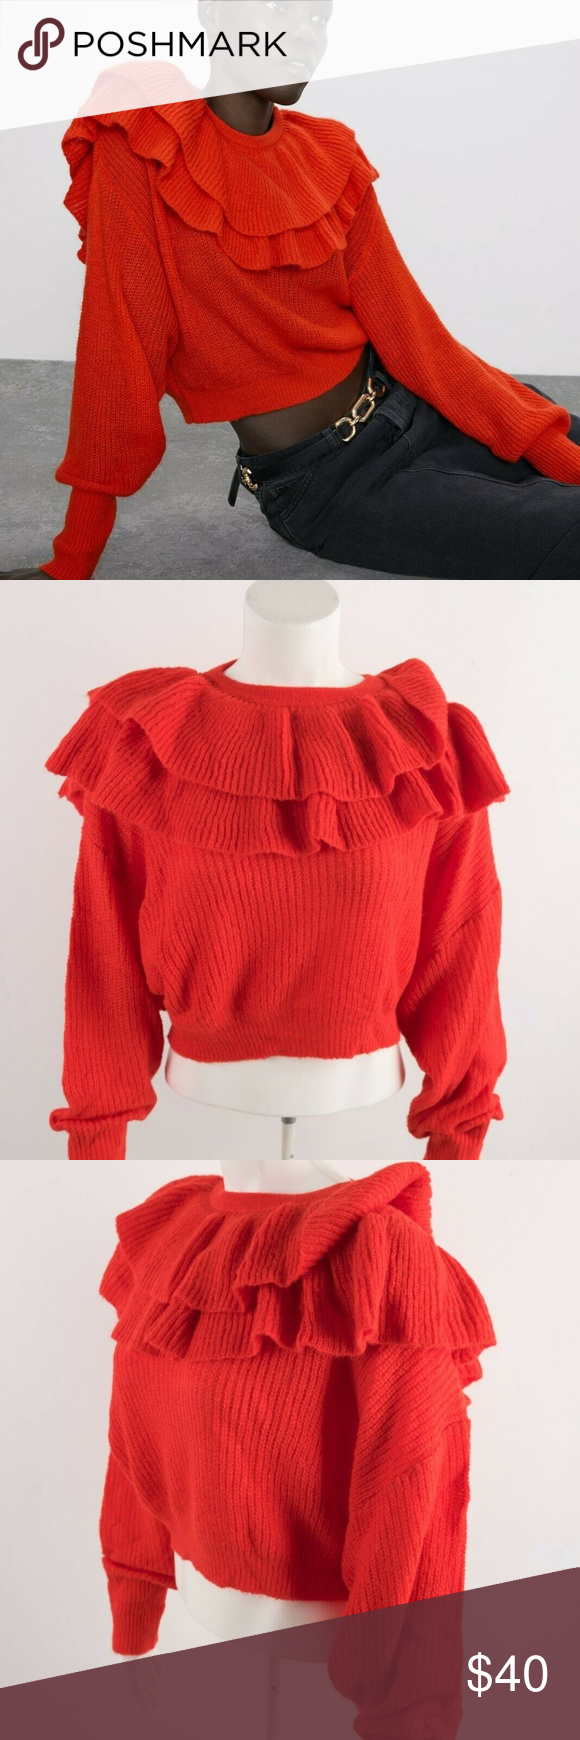 Cotton womens sweater.Ruffle top sweater.Cotton ruffle top.Womens ruffle short sweater..Stripe crop jumper.Vintage Stripe Knit Sweater